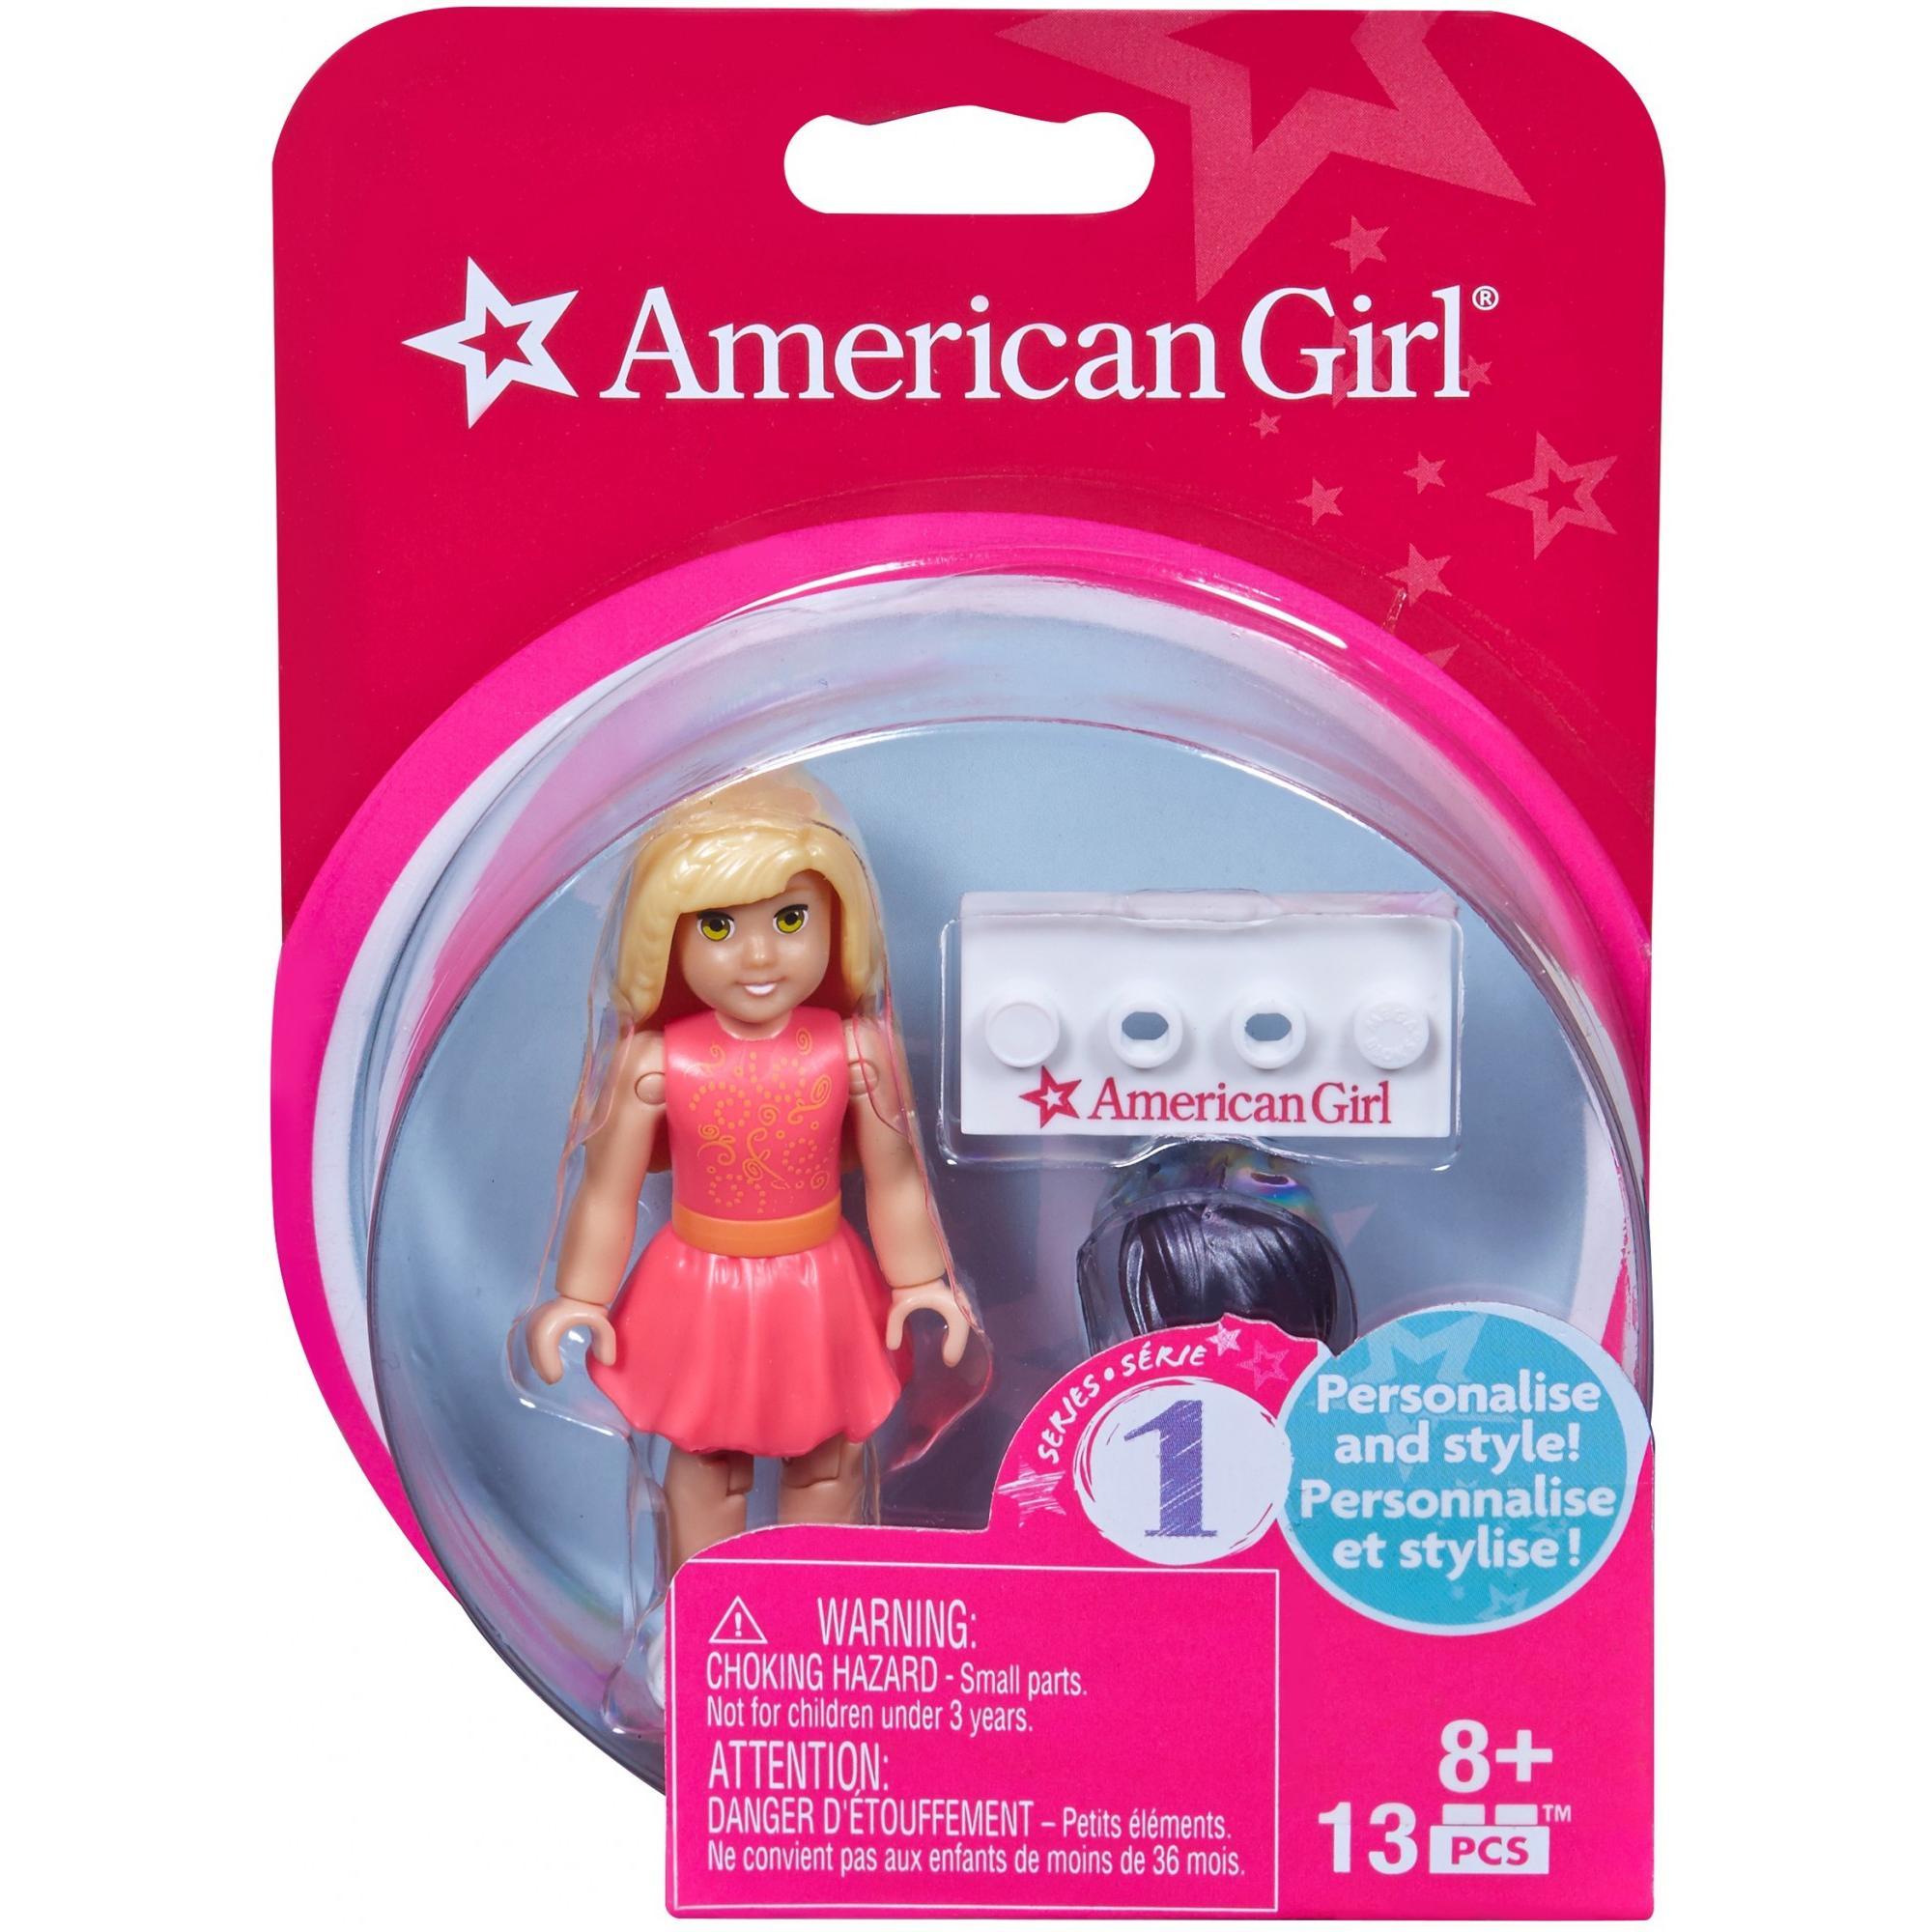 Mega Bloks Series 1 American Girl #1 Collectible Figure